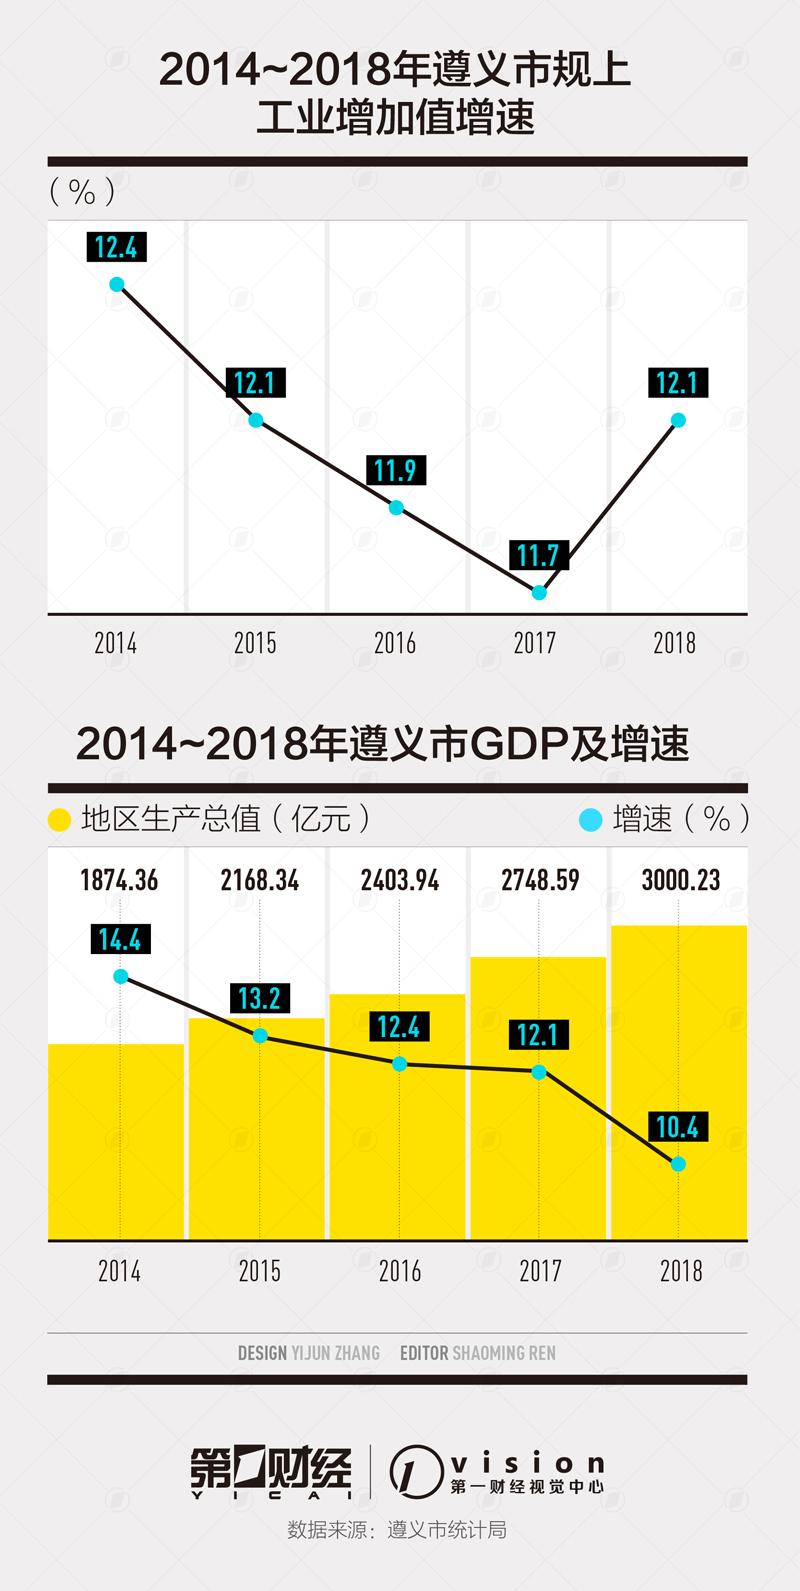 GDP百强城市中它增速最快 罕见多年保持2位数增长|工业增加值|白酒产业